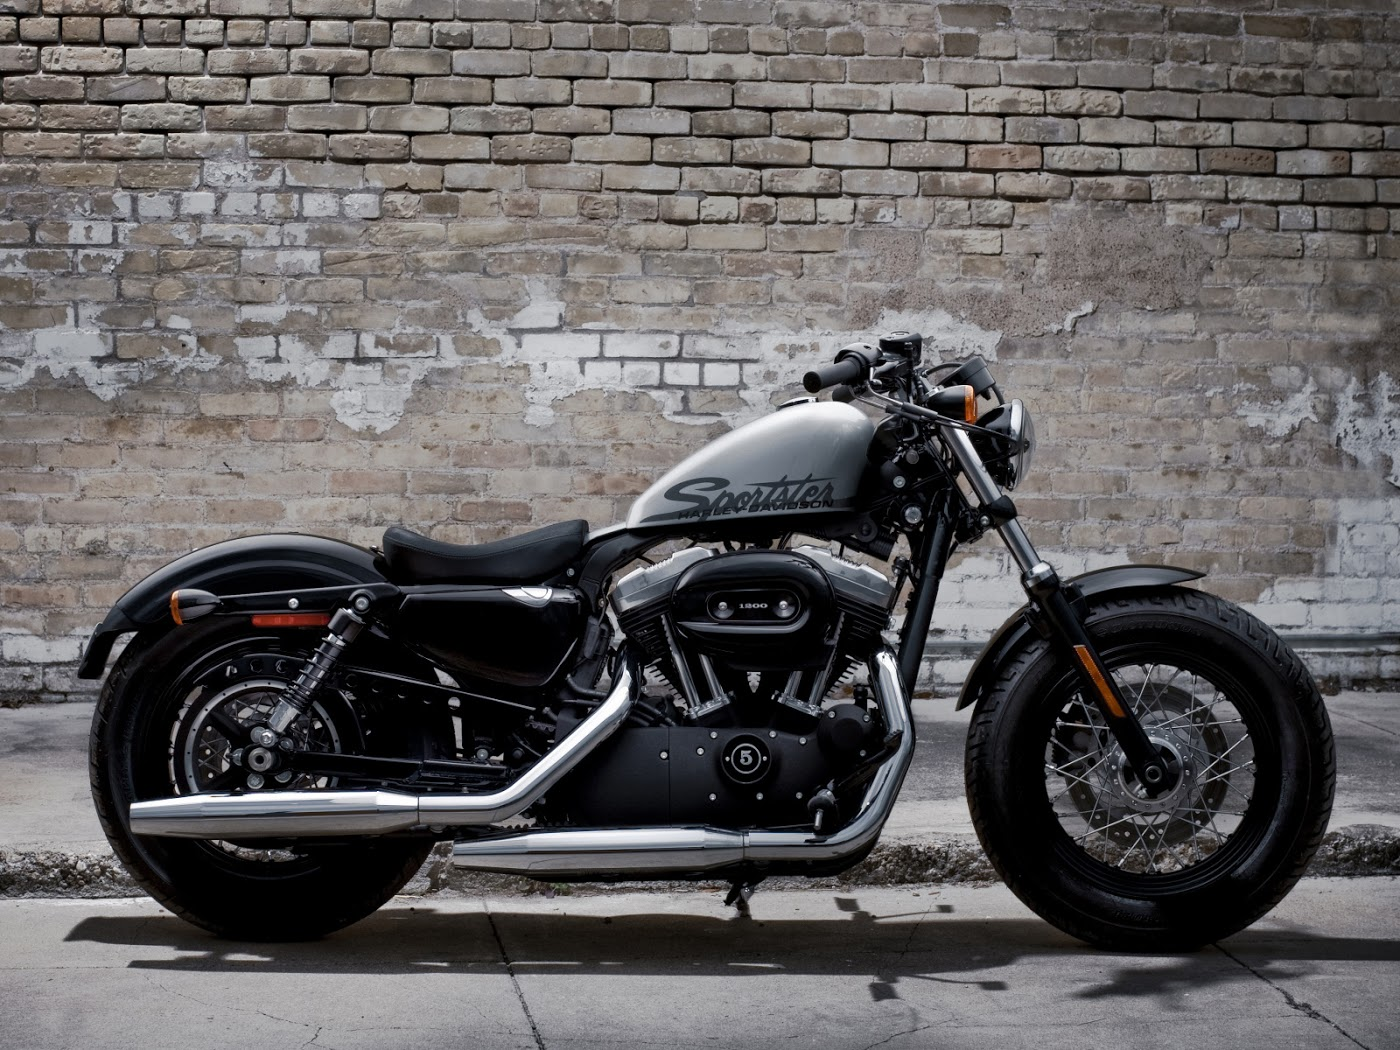 Harley Davidson Bikes Hd Wallpaper Images All Motorcycles Models